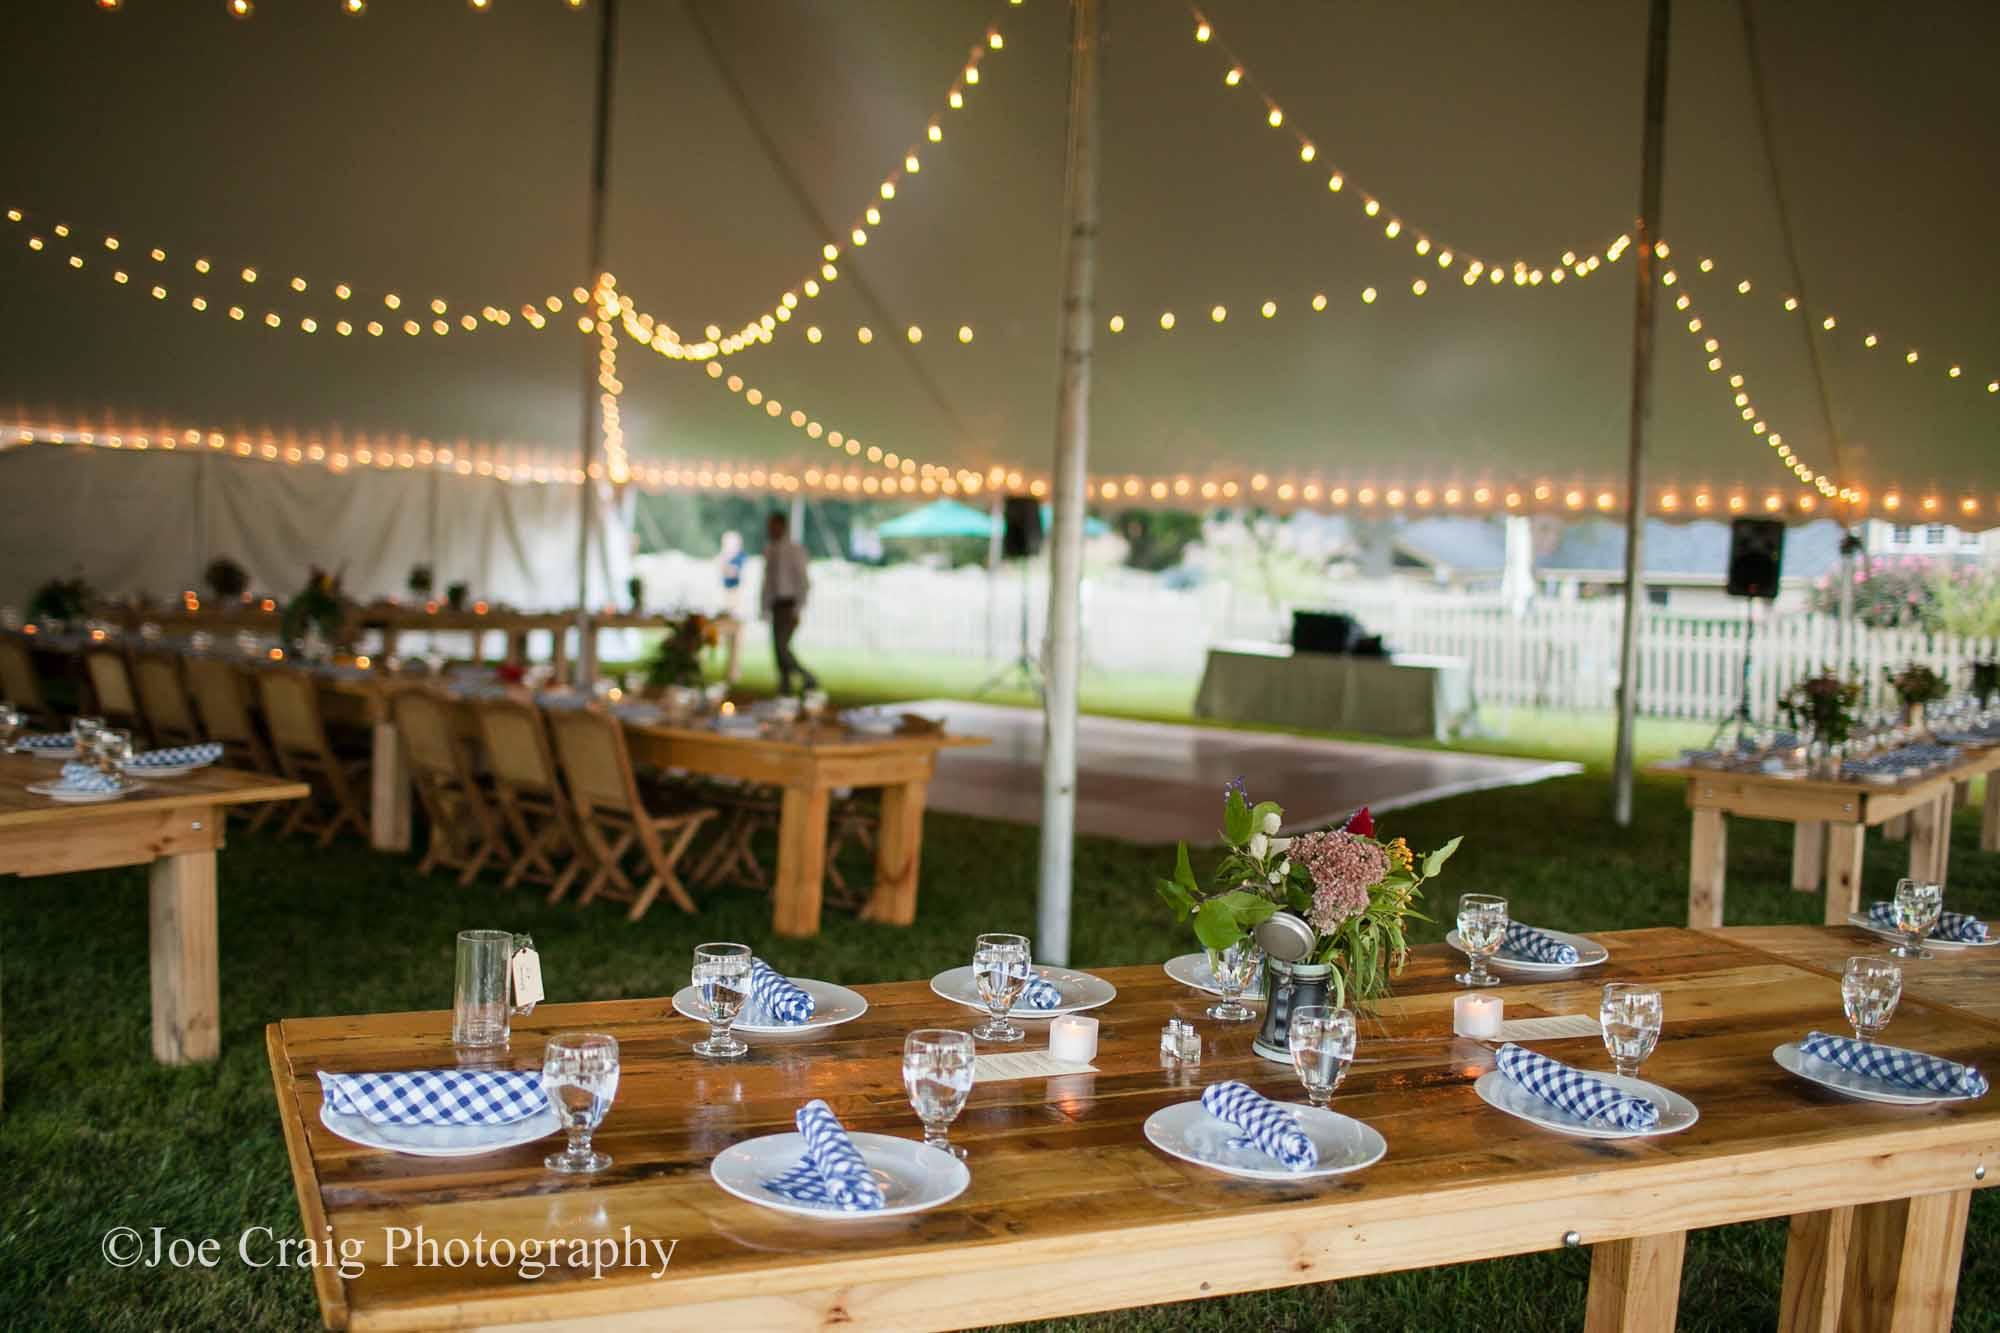 Tent, table, and lighting rentals in Maheim